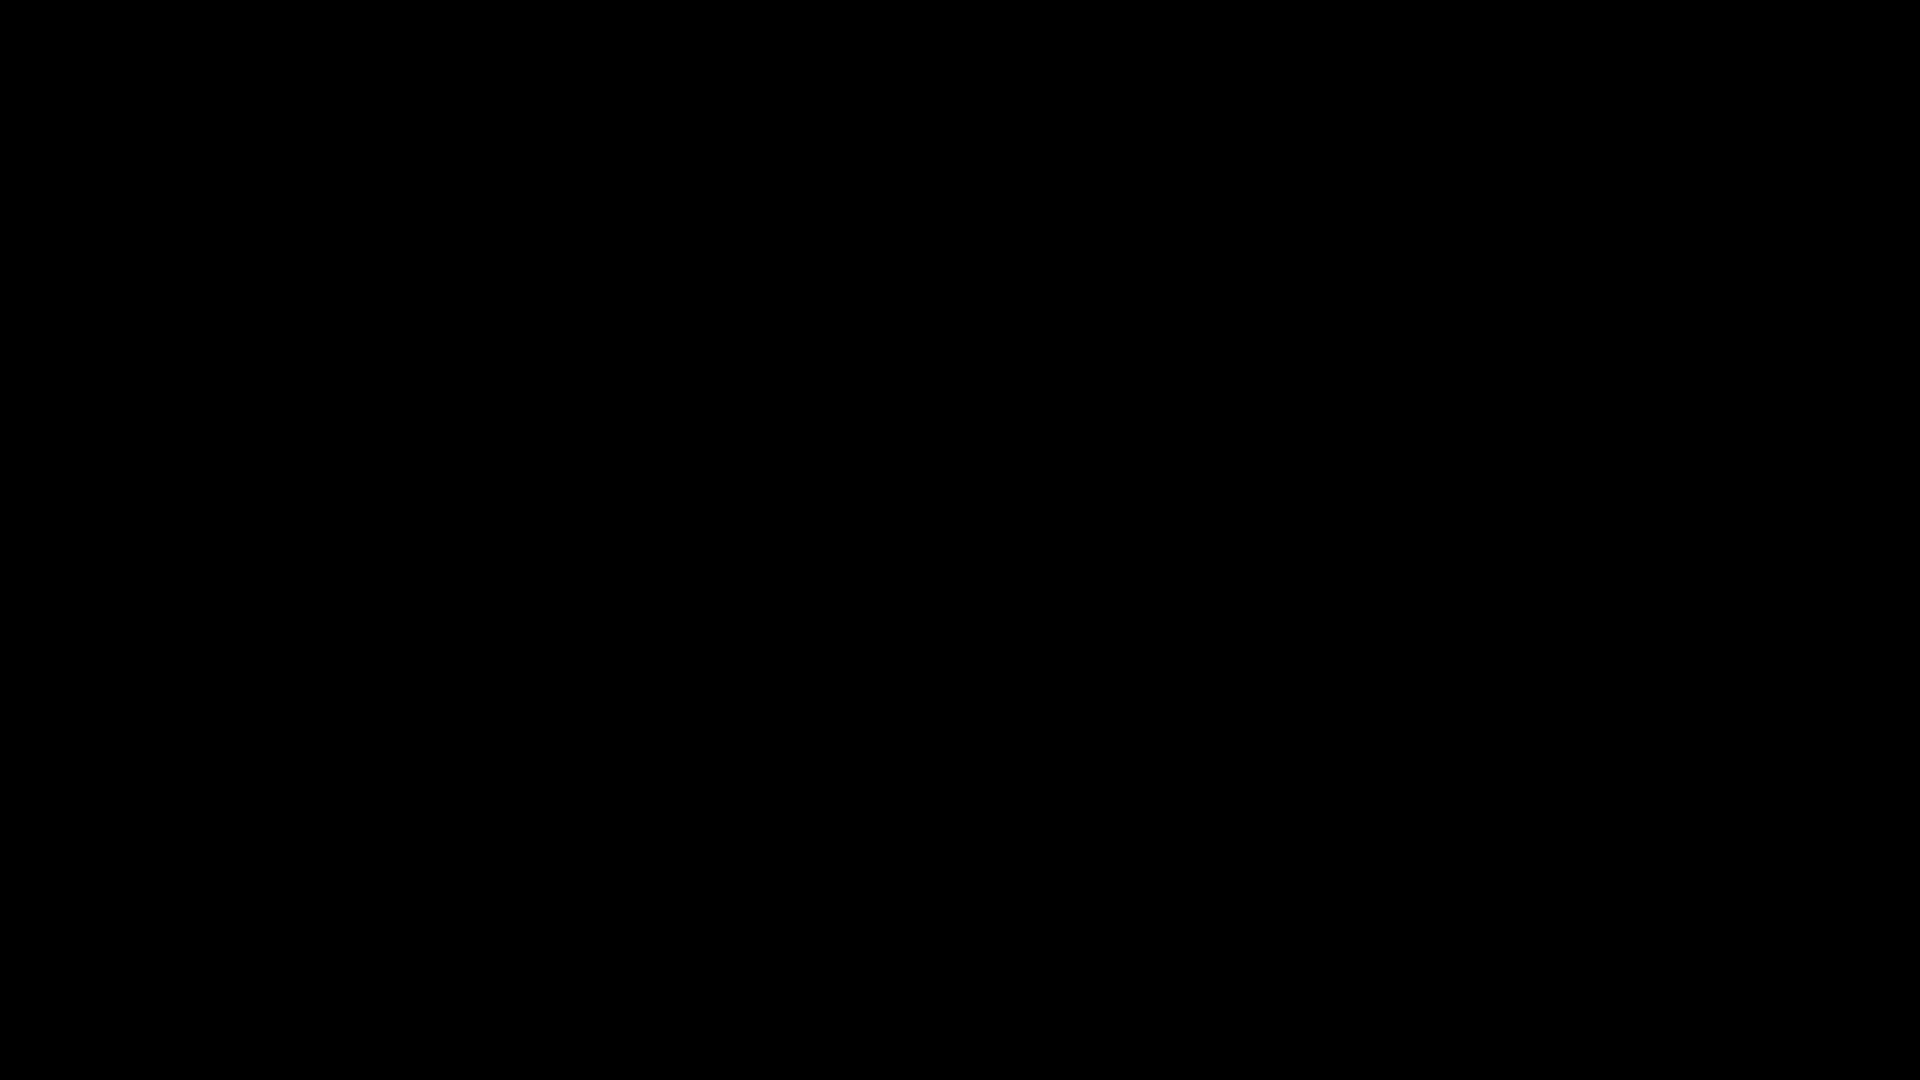 Plain Black Wallpaper 6 Background